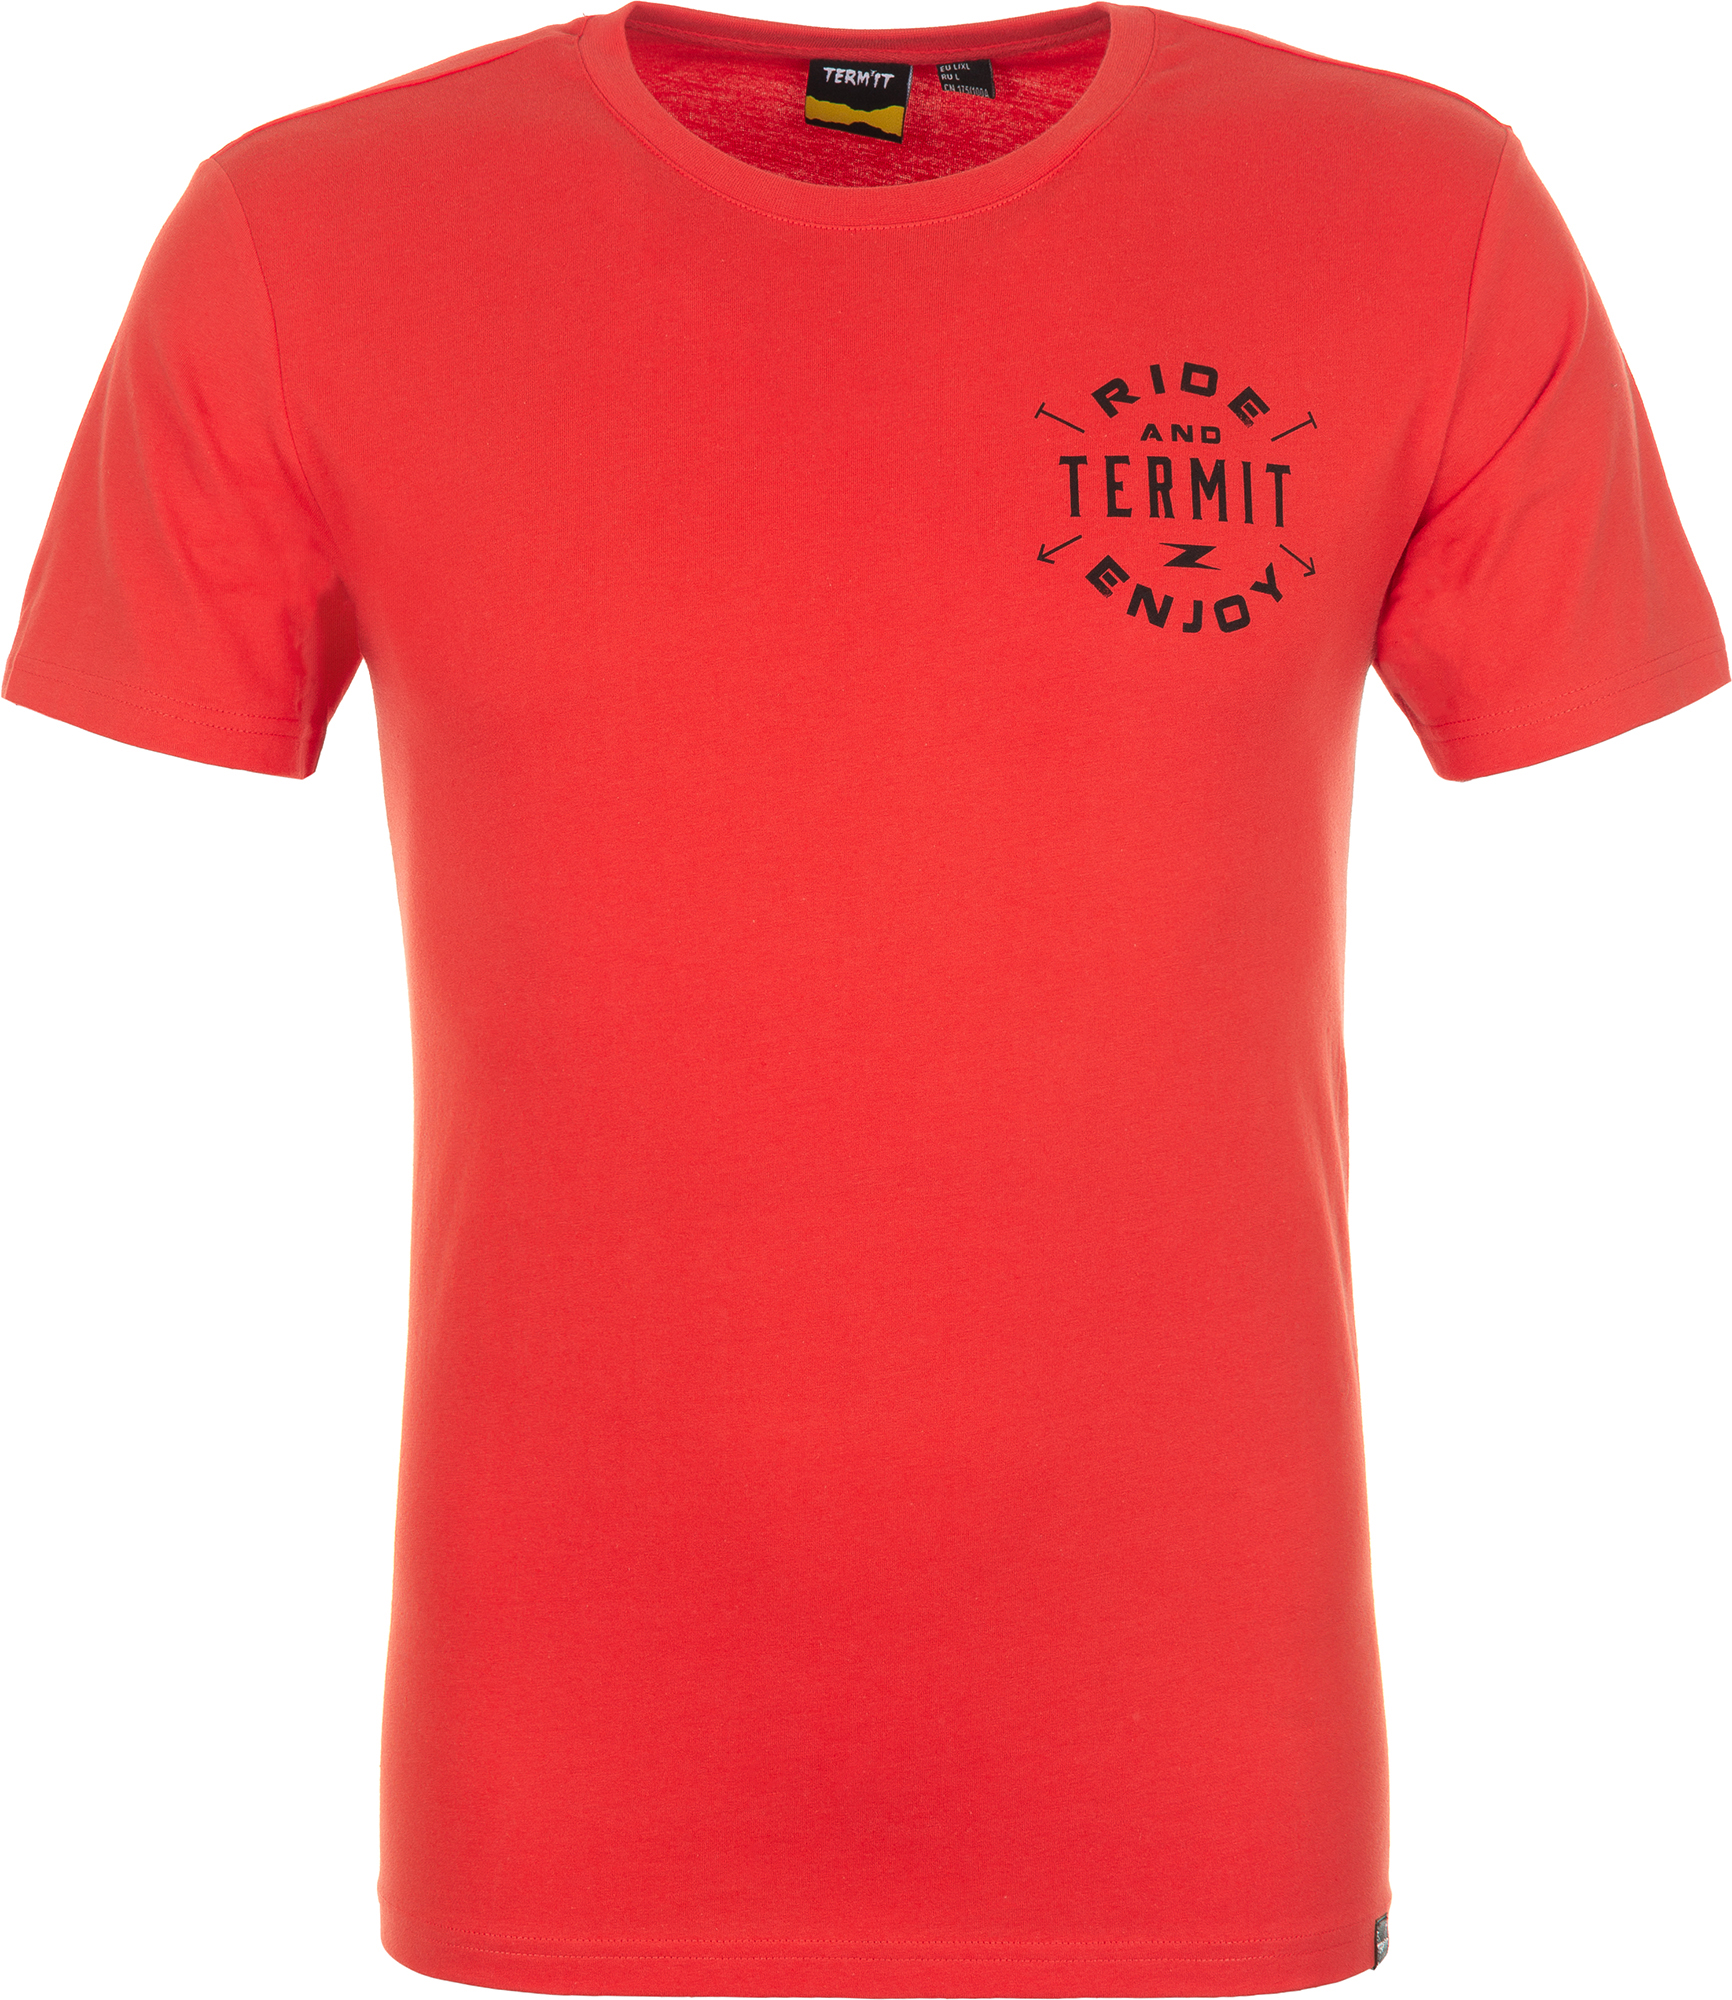 Termit Футболка мужская Termit, размер 50